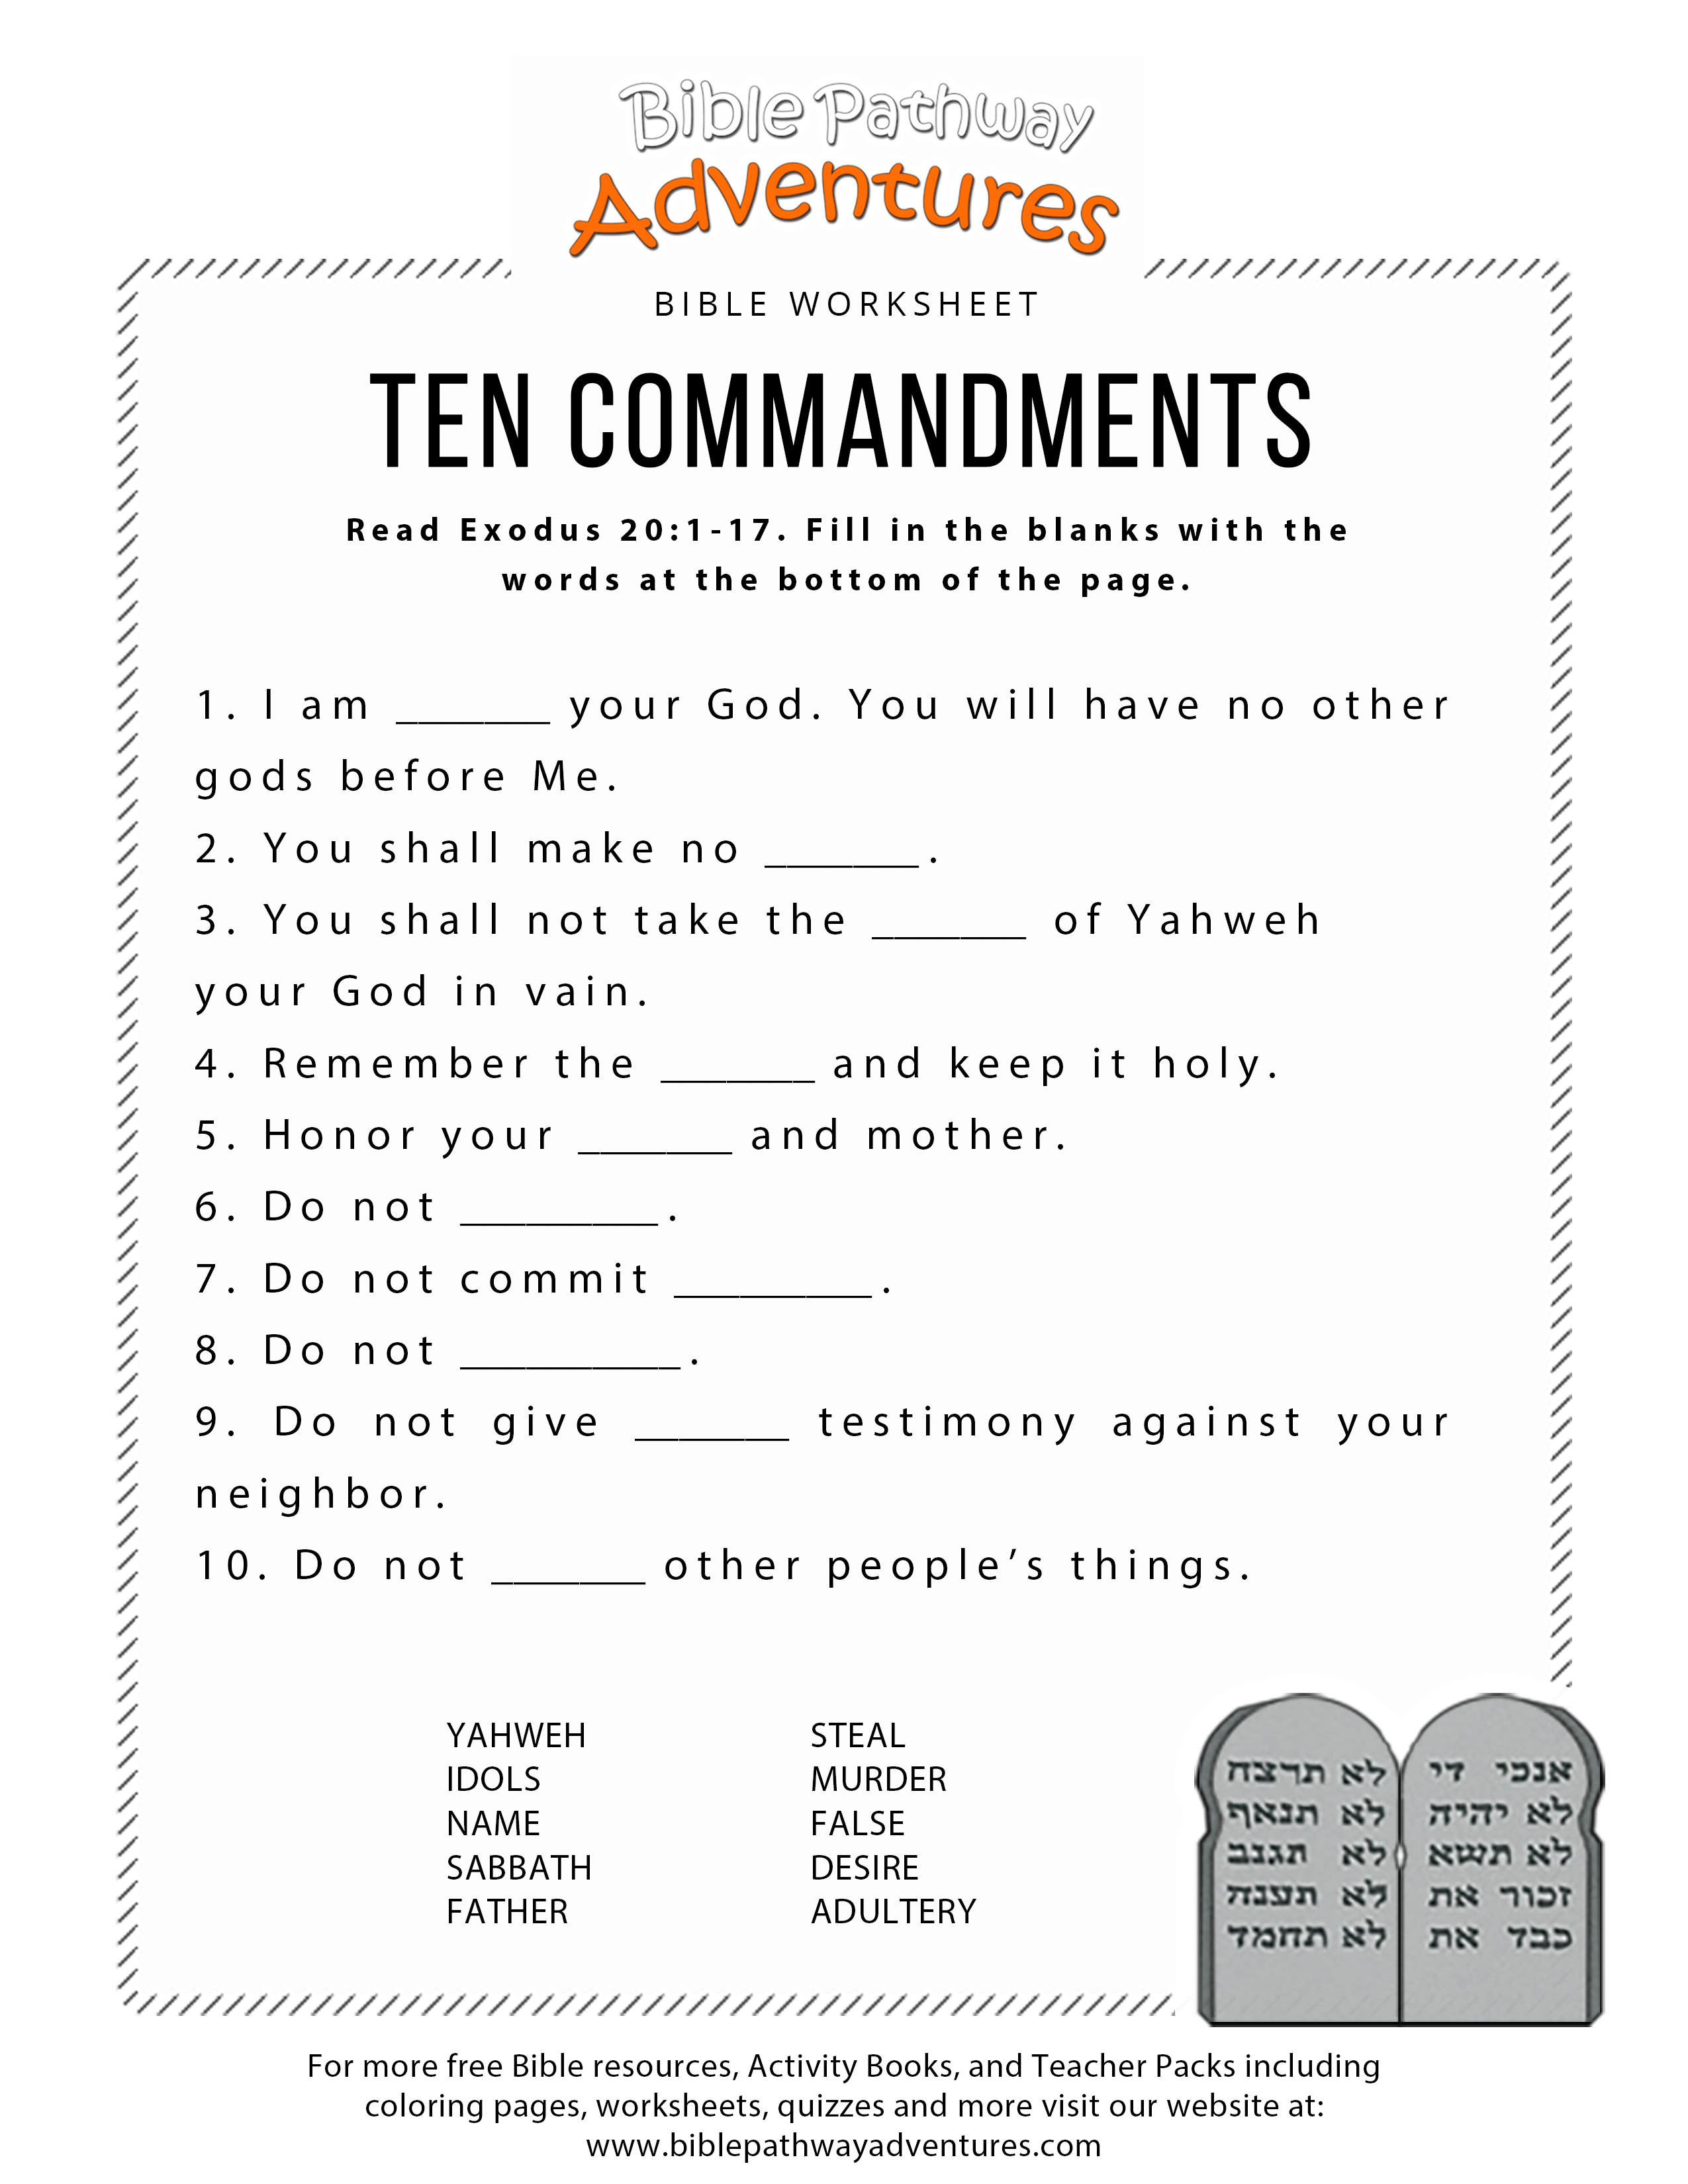 Ten Commandments Worksheet For Kids | Worksheets For Psr | Bible - Free Children's Bible Printables